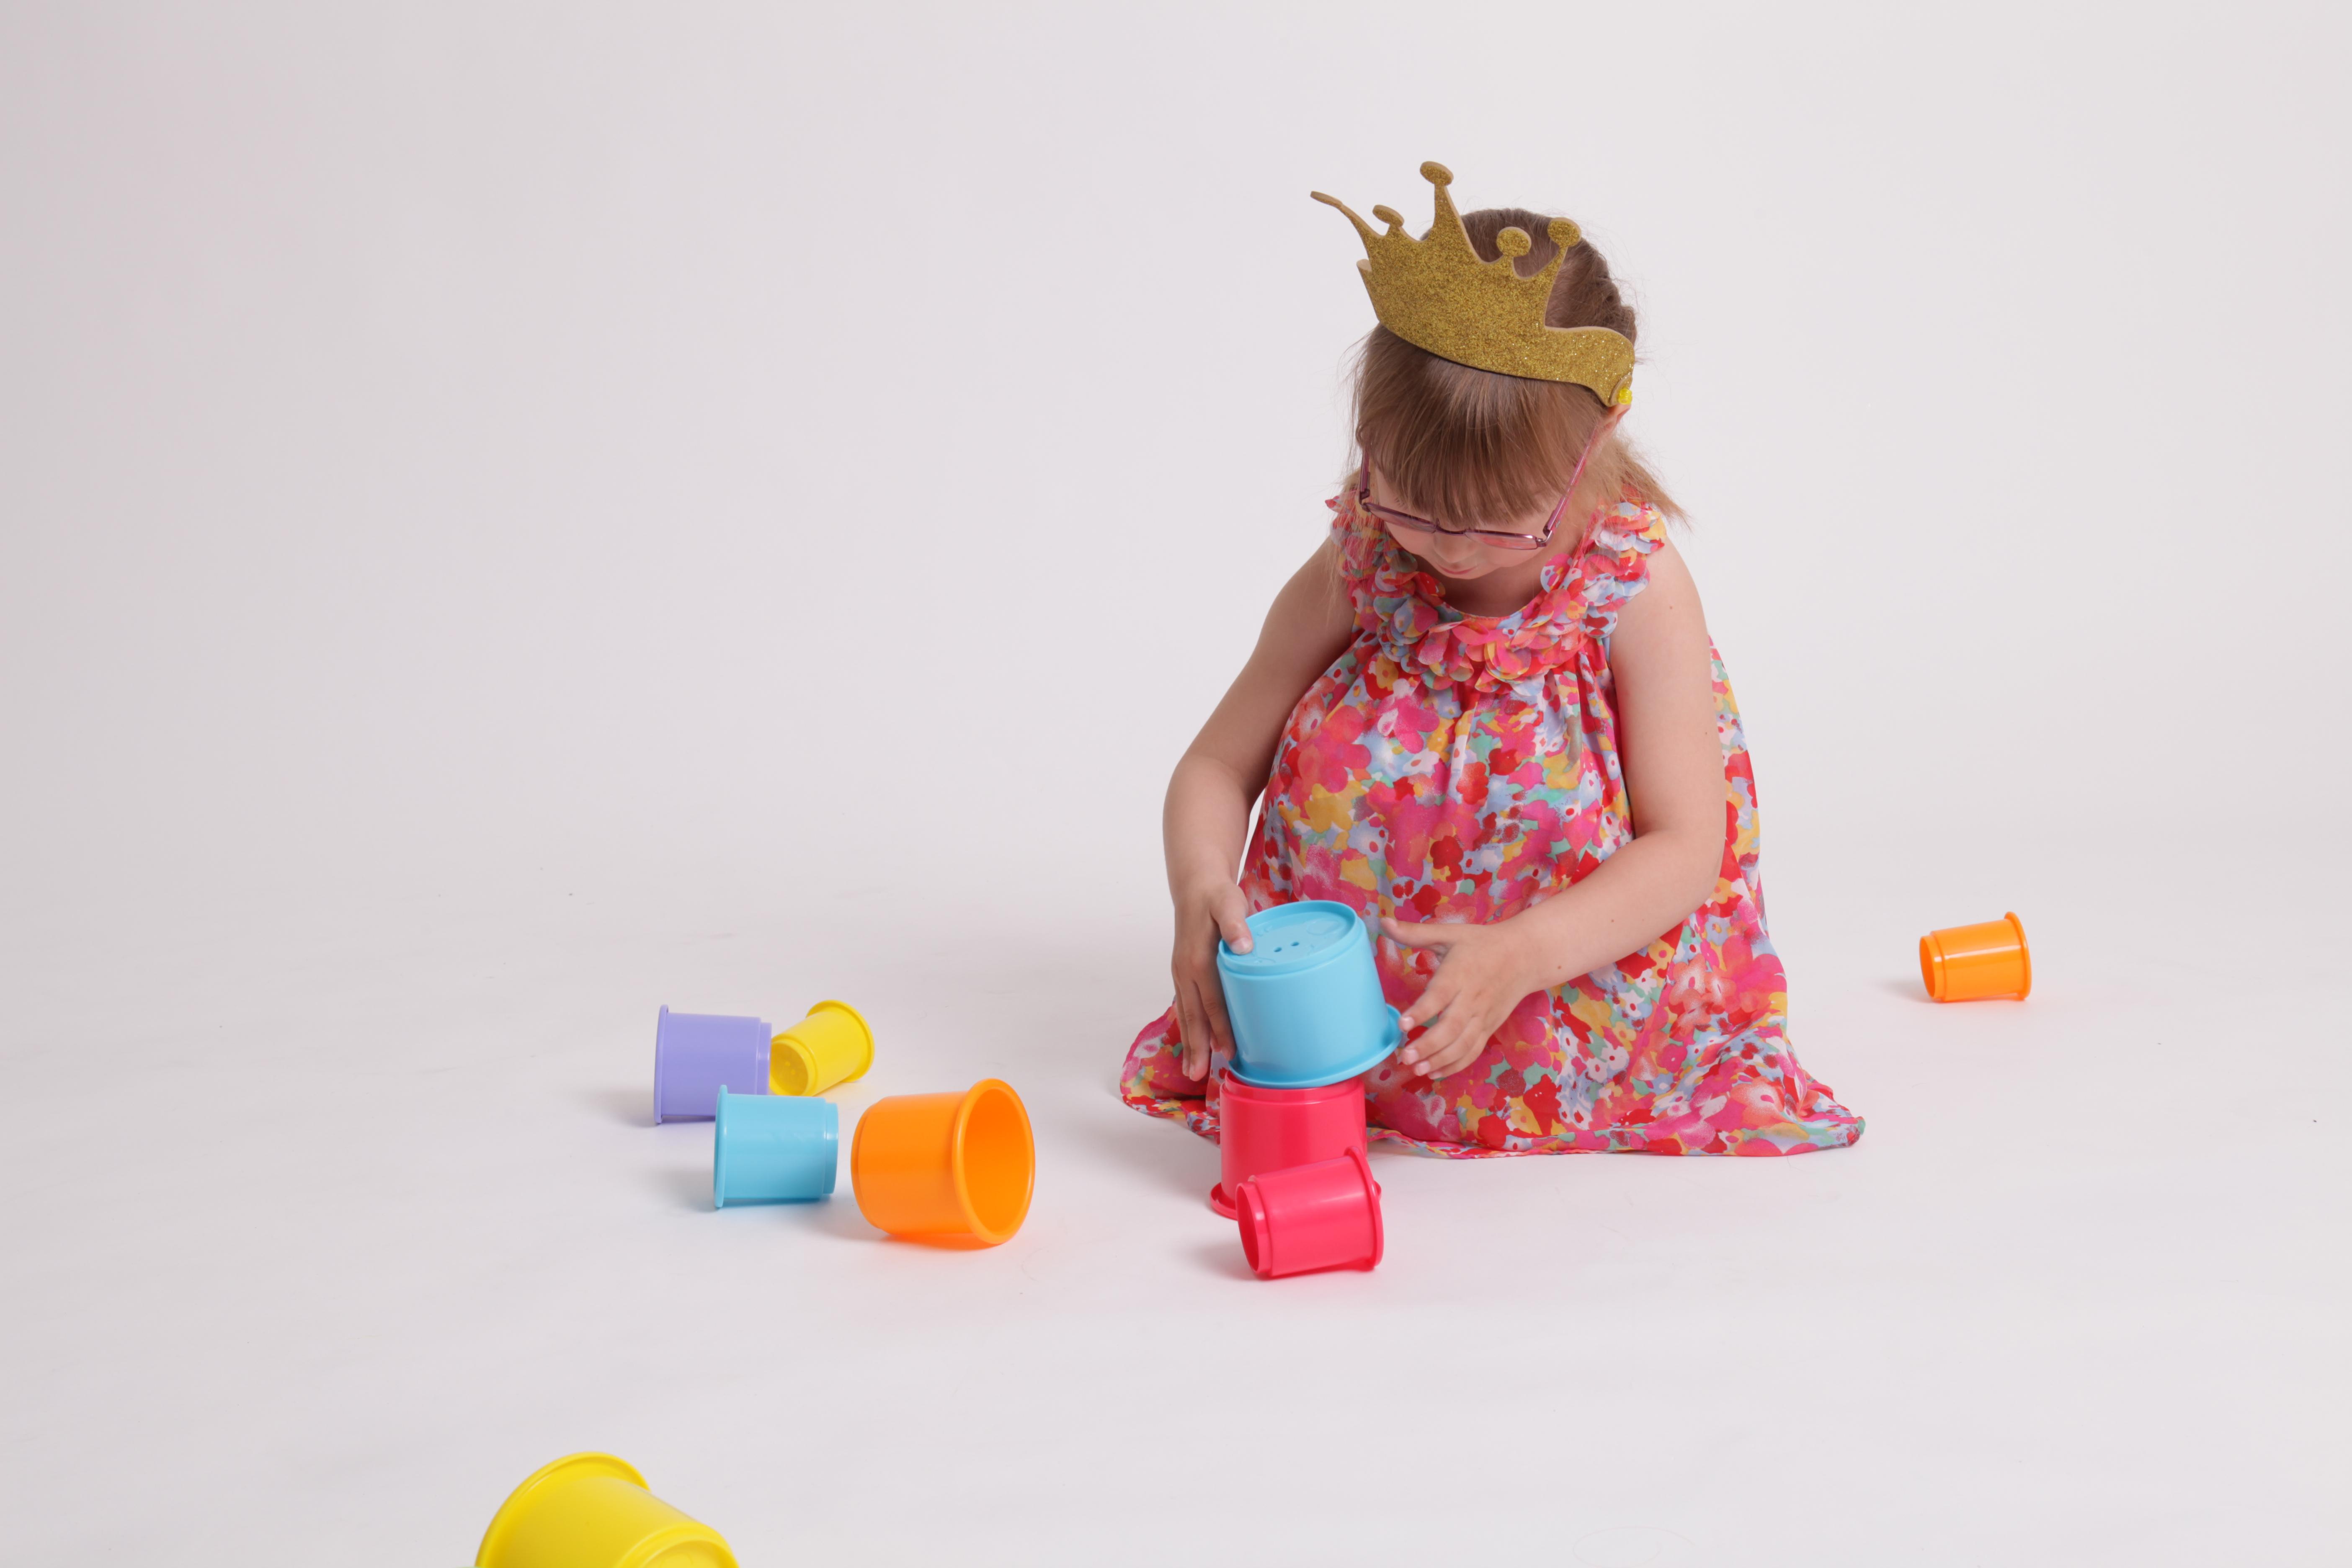 Nursery & School Photography